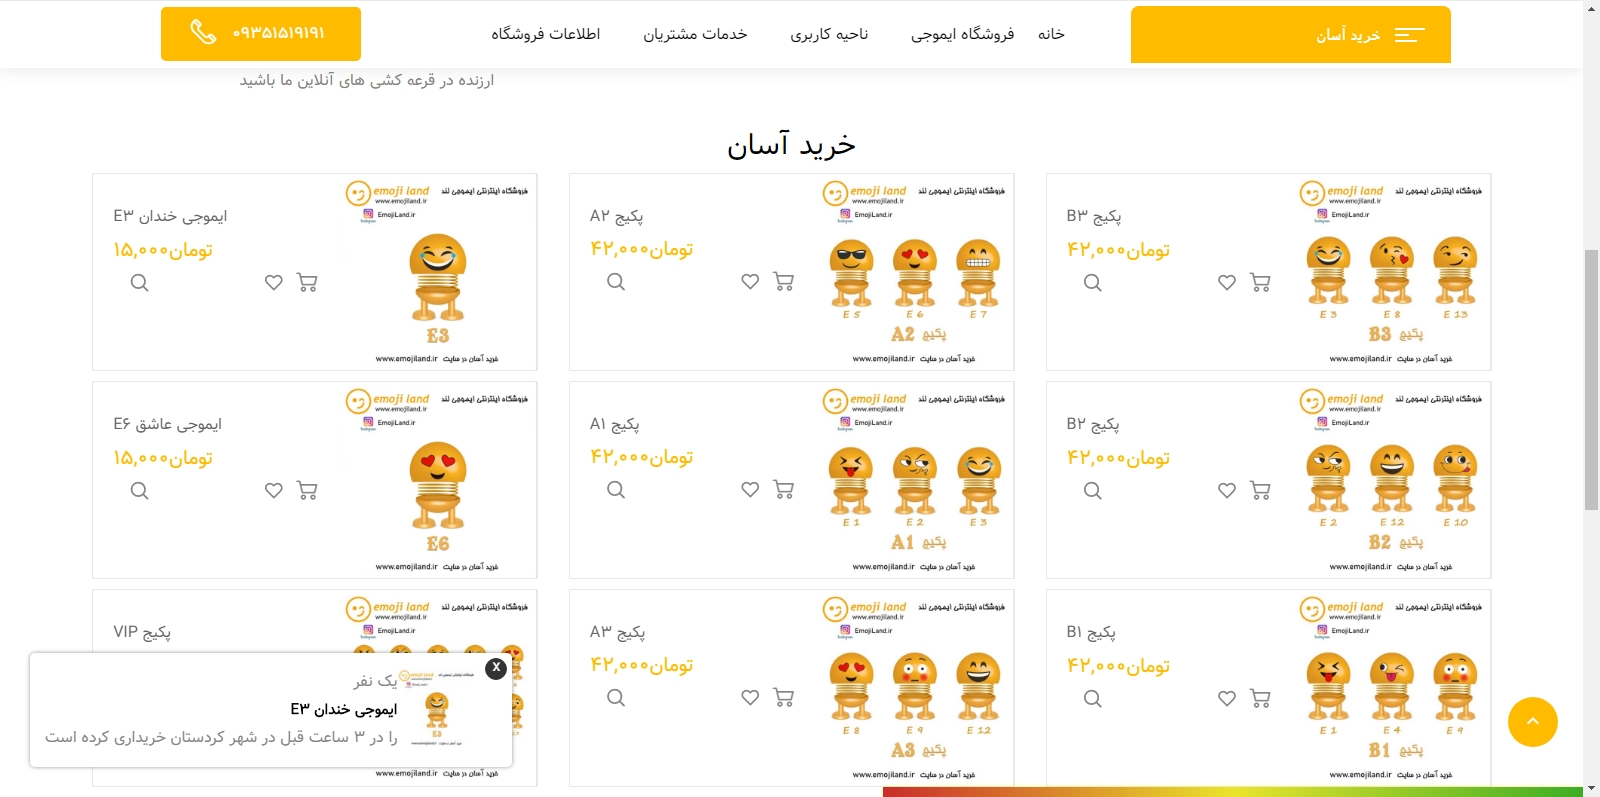 screenshot 20200526 002512 - emojiland.ir